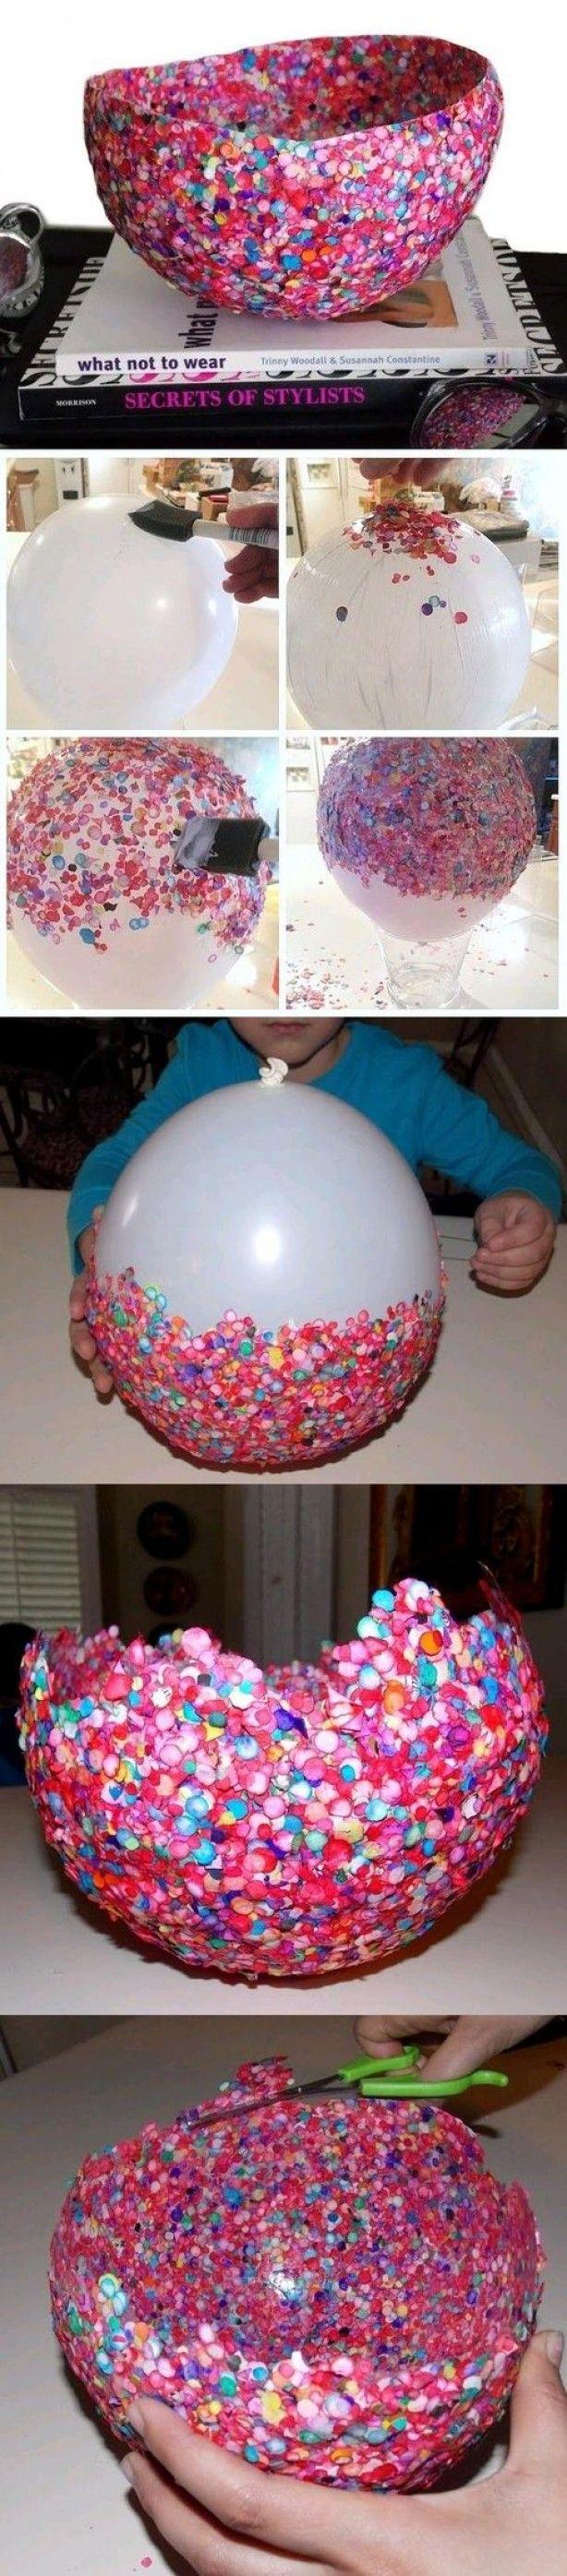 DIY Confetti Vase.....25 Easy Handmade Home Craft Ideas #DIYCrafts